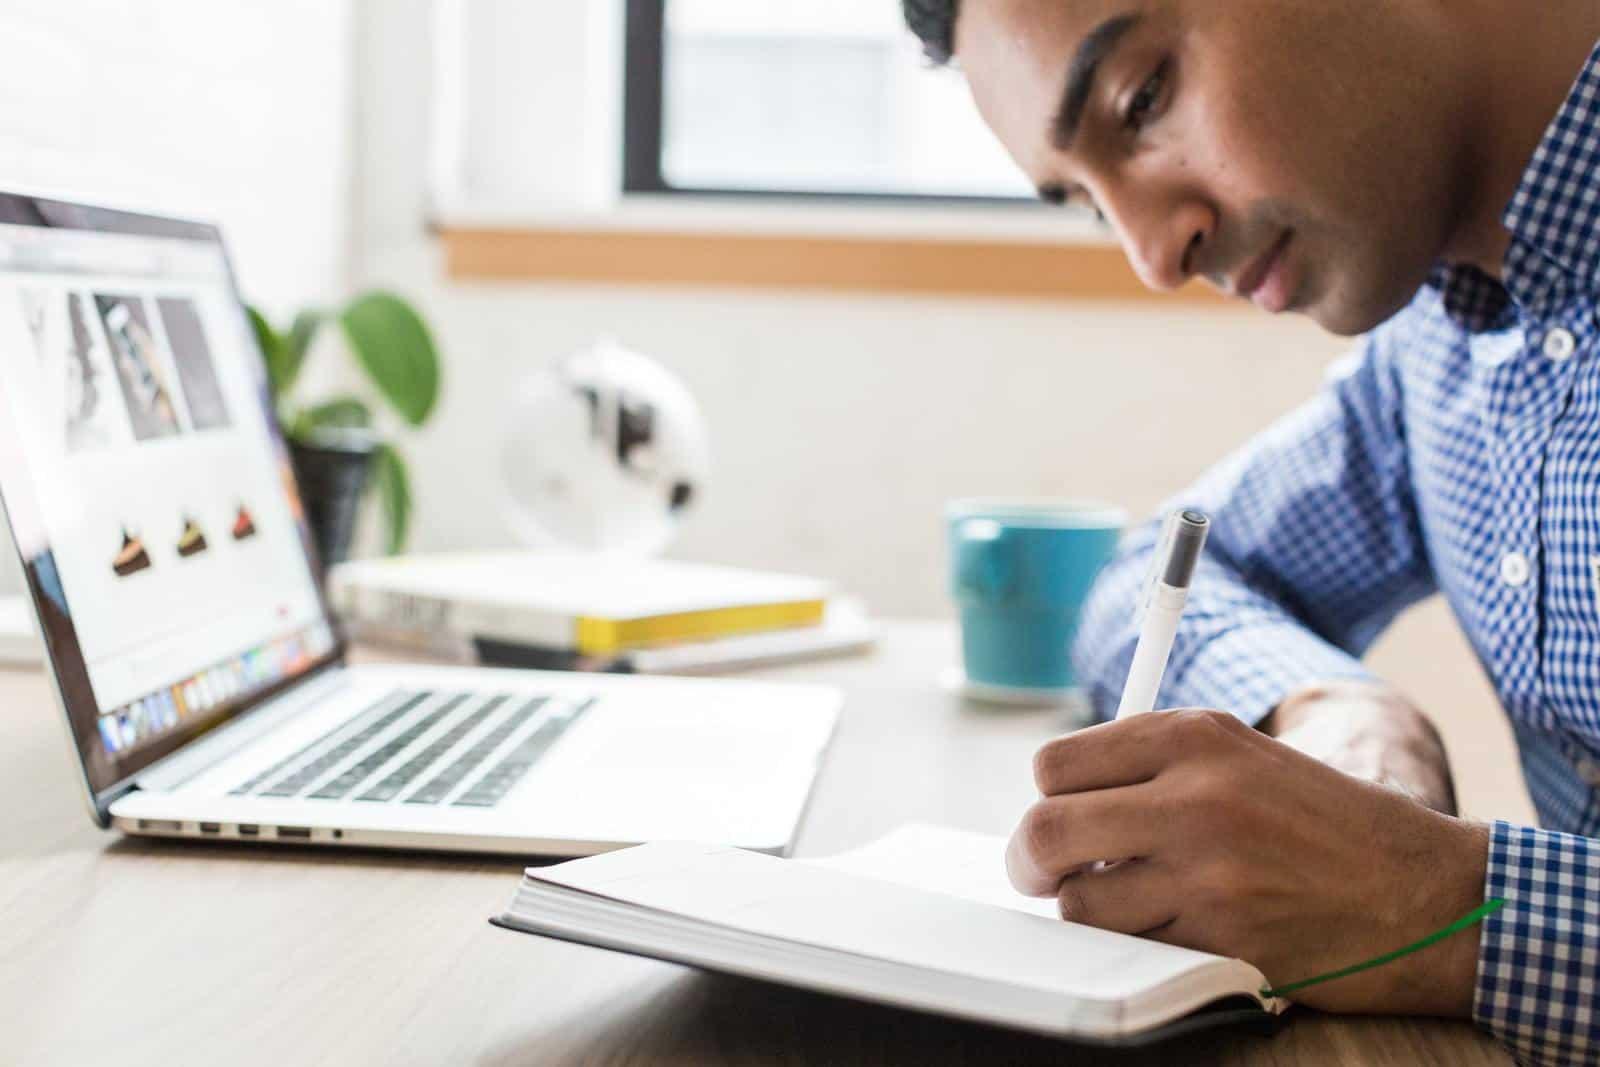 Man writing things down